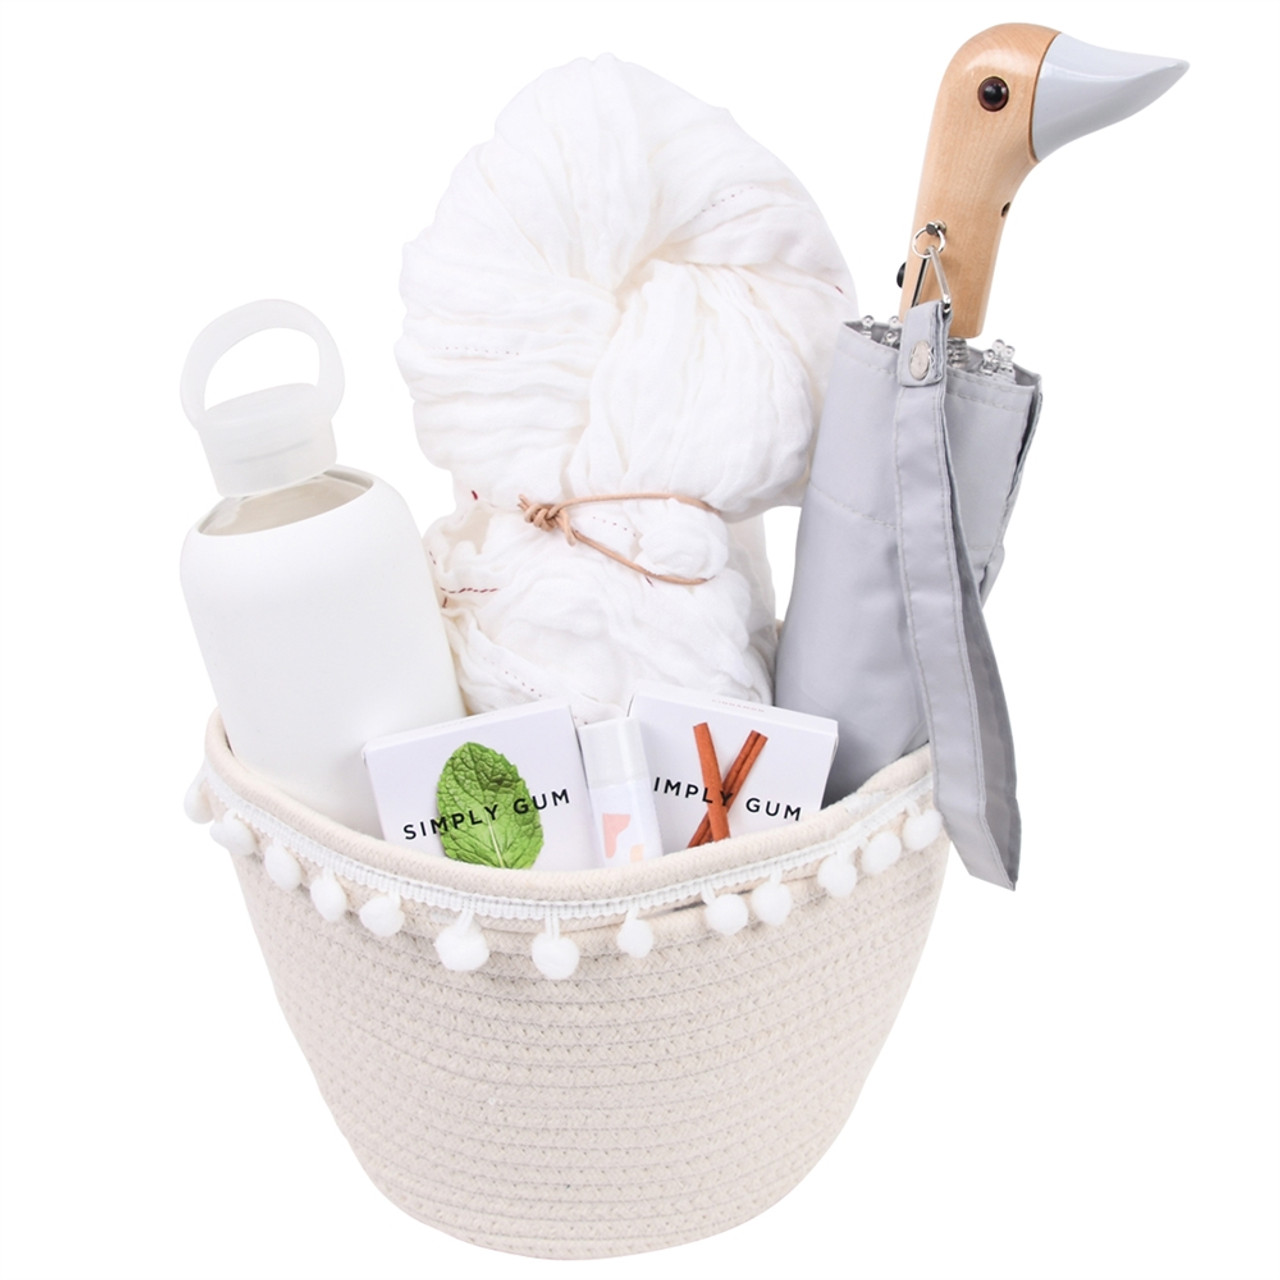 Birthday gift Basket for Women  - On The Go